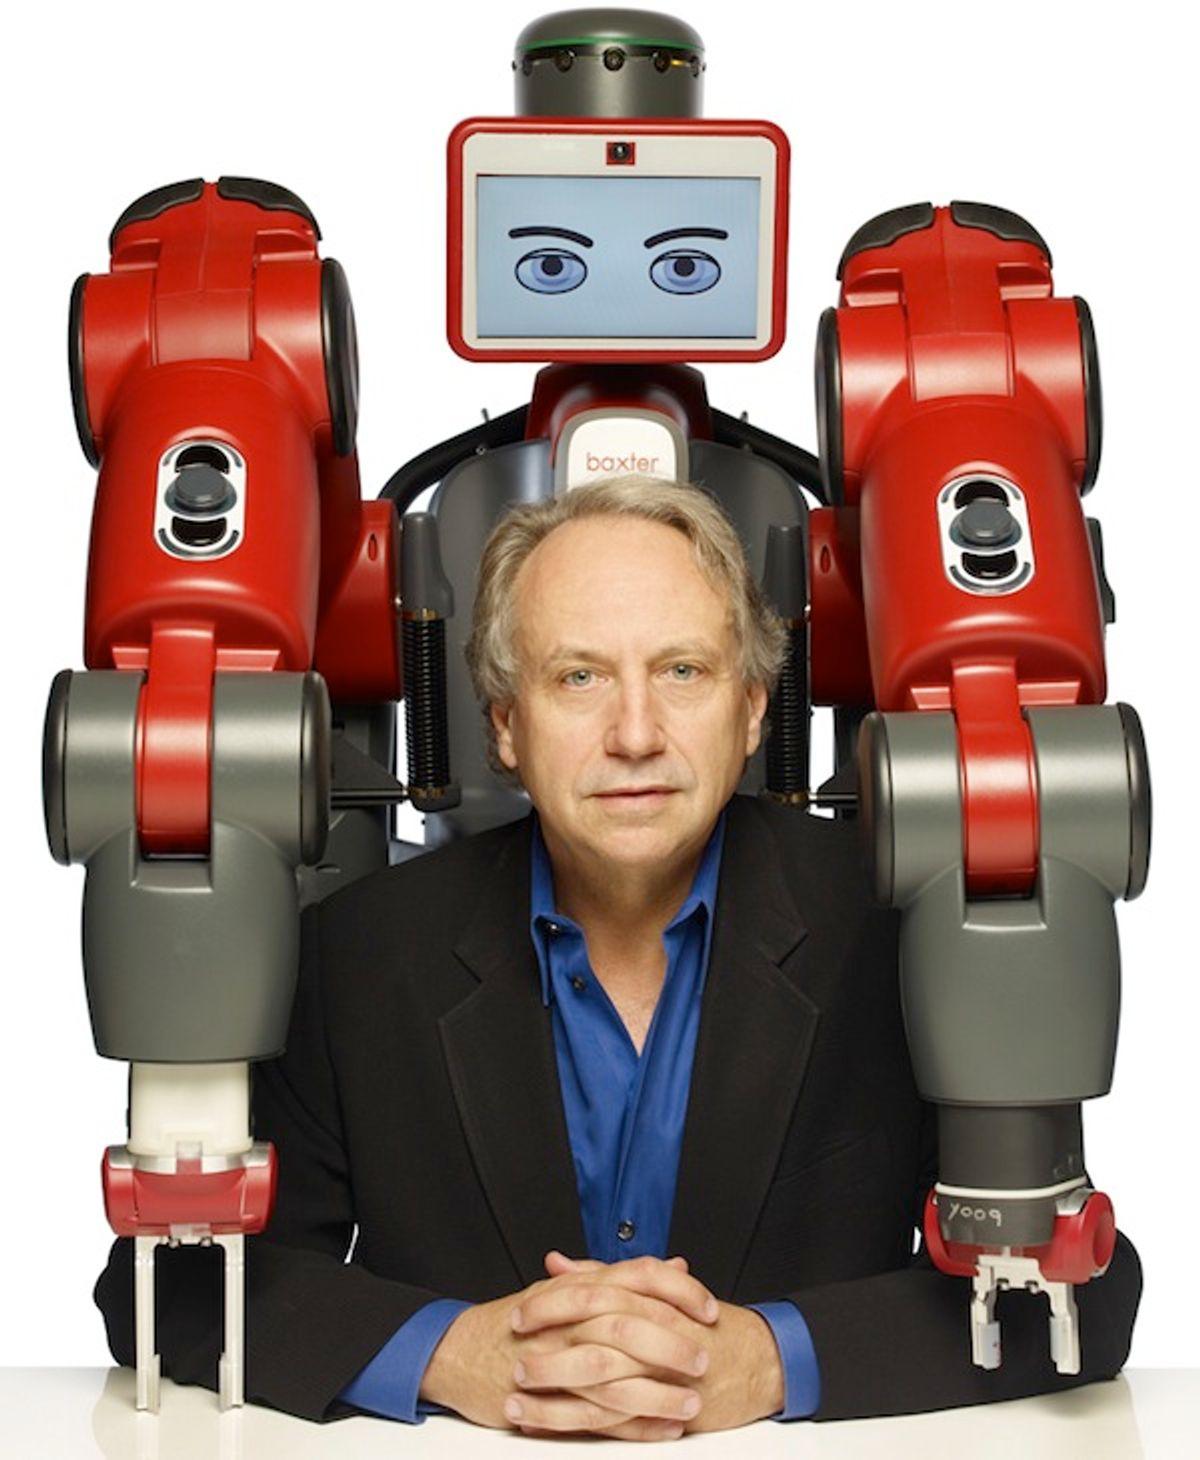 Rethink Robotics Announces Baxter Robot Helper, We Go Hands-On in Boston